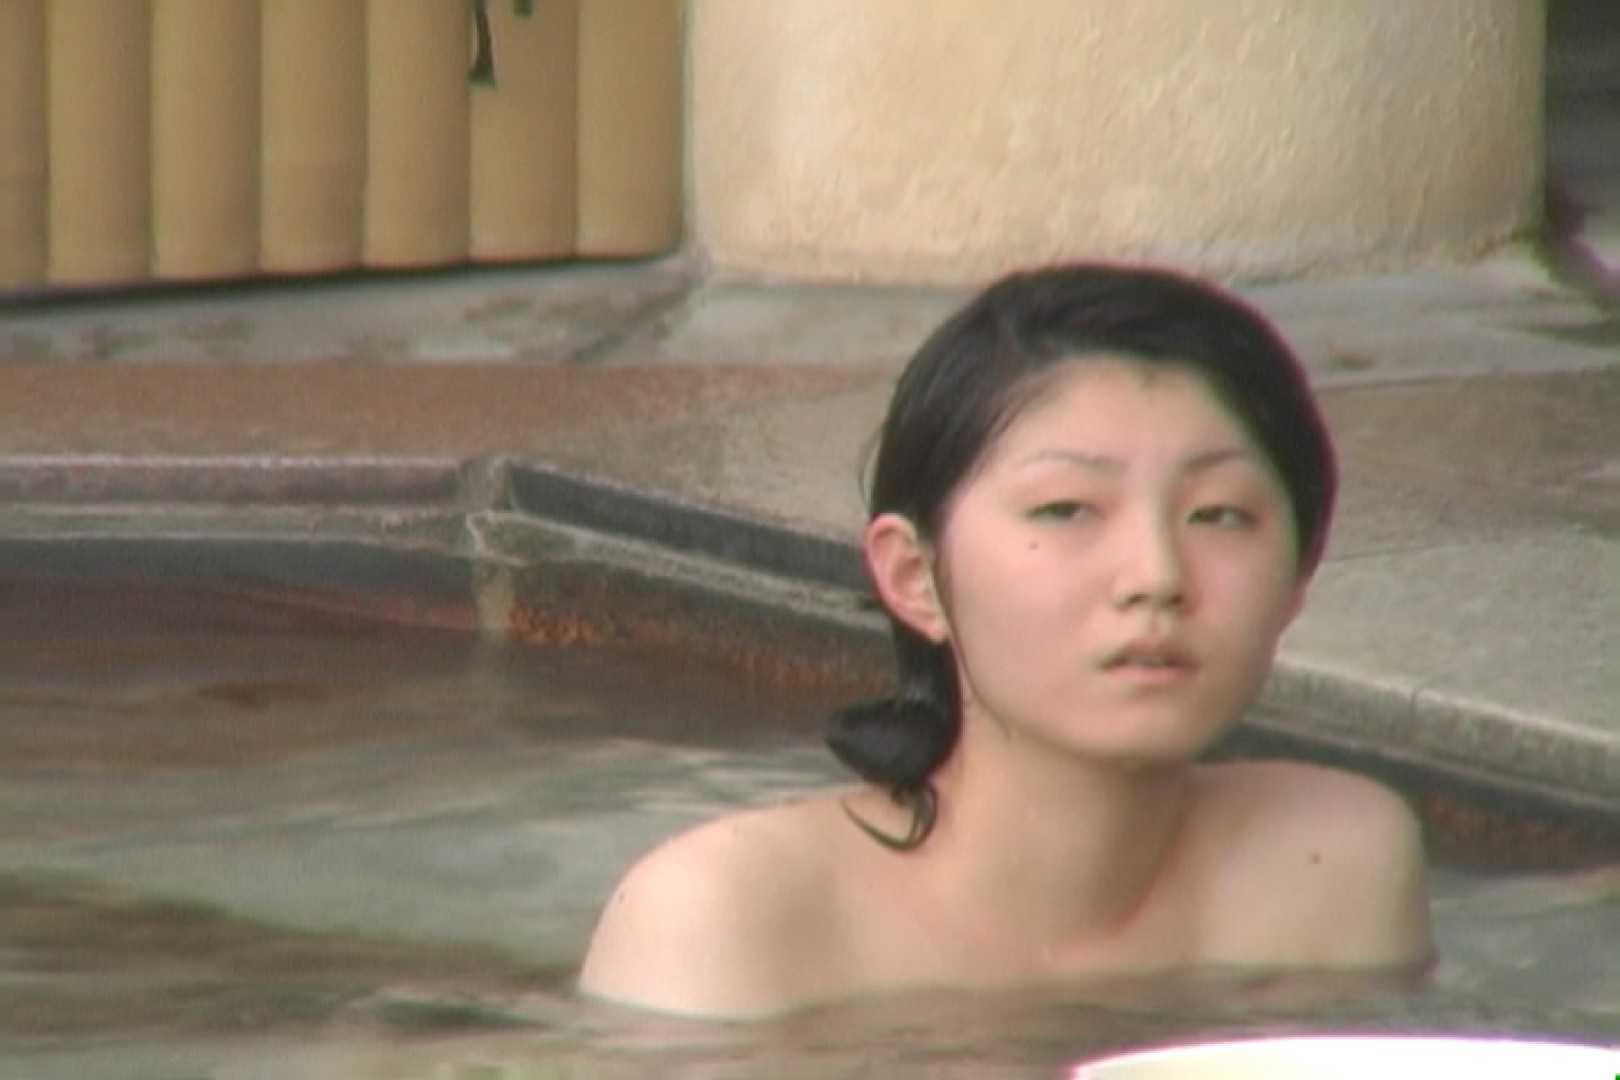 Aquaな露天風呂Vol.579 盗撮 AV無料 52画像 20